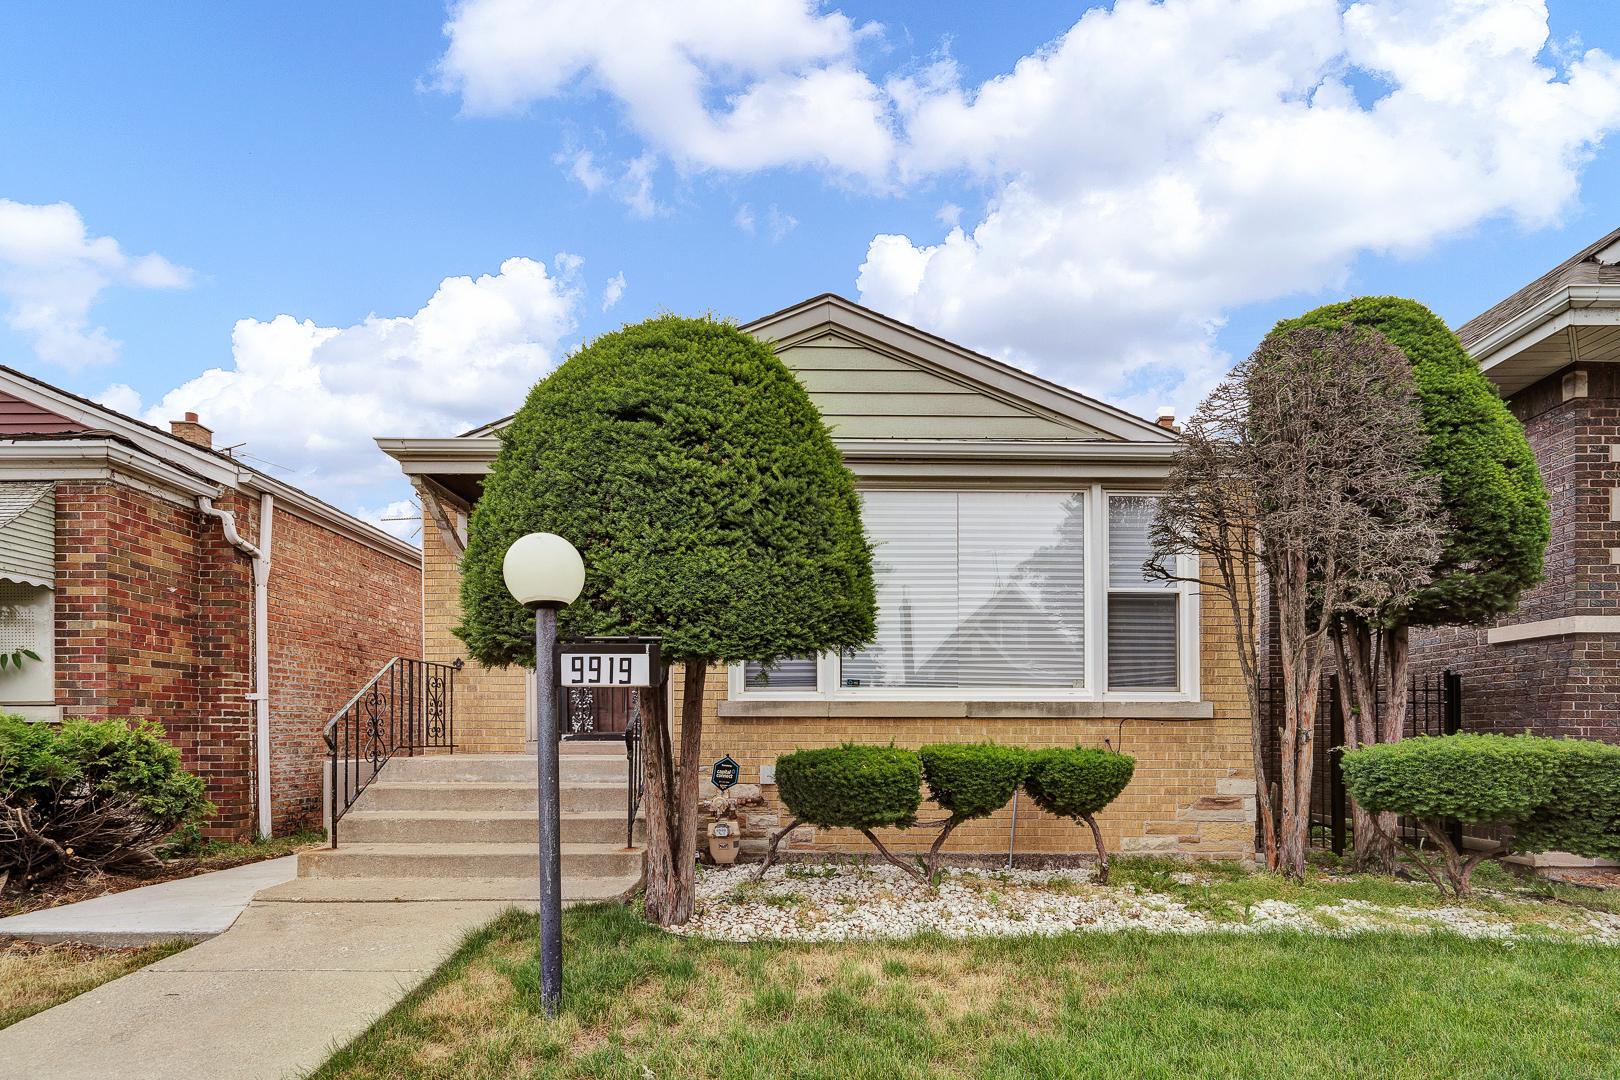 9919 S Carpenter Street, Chicago IL 60643